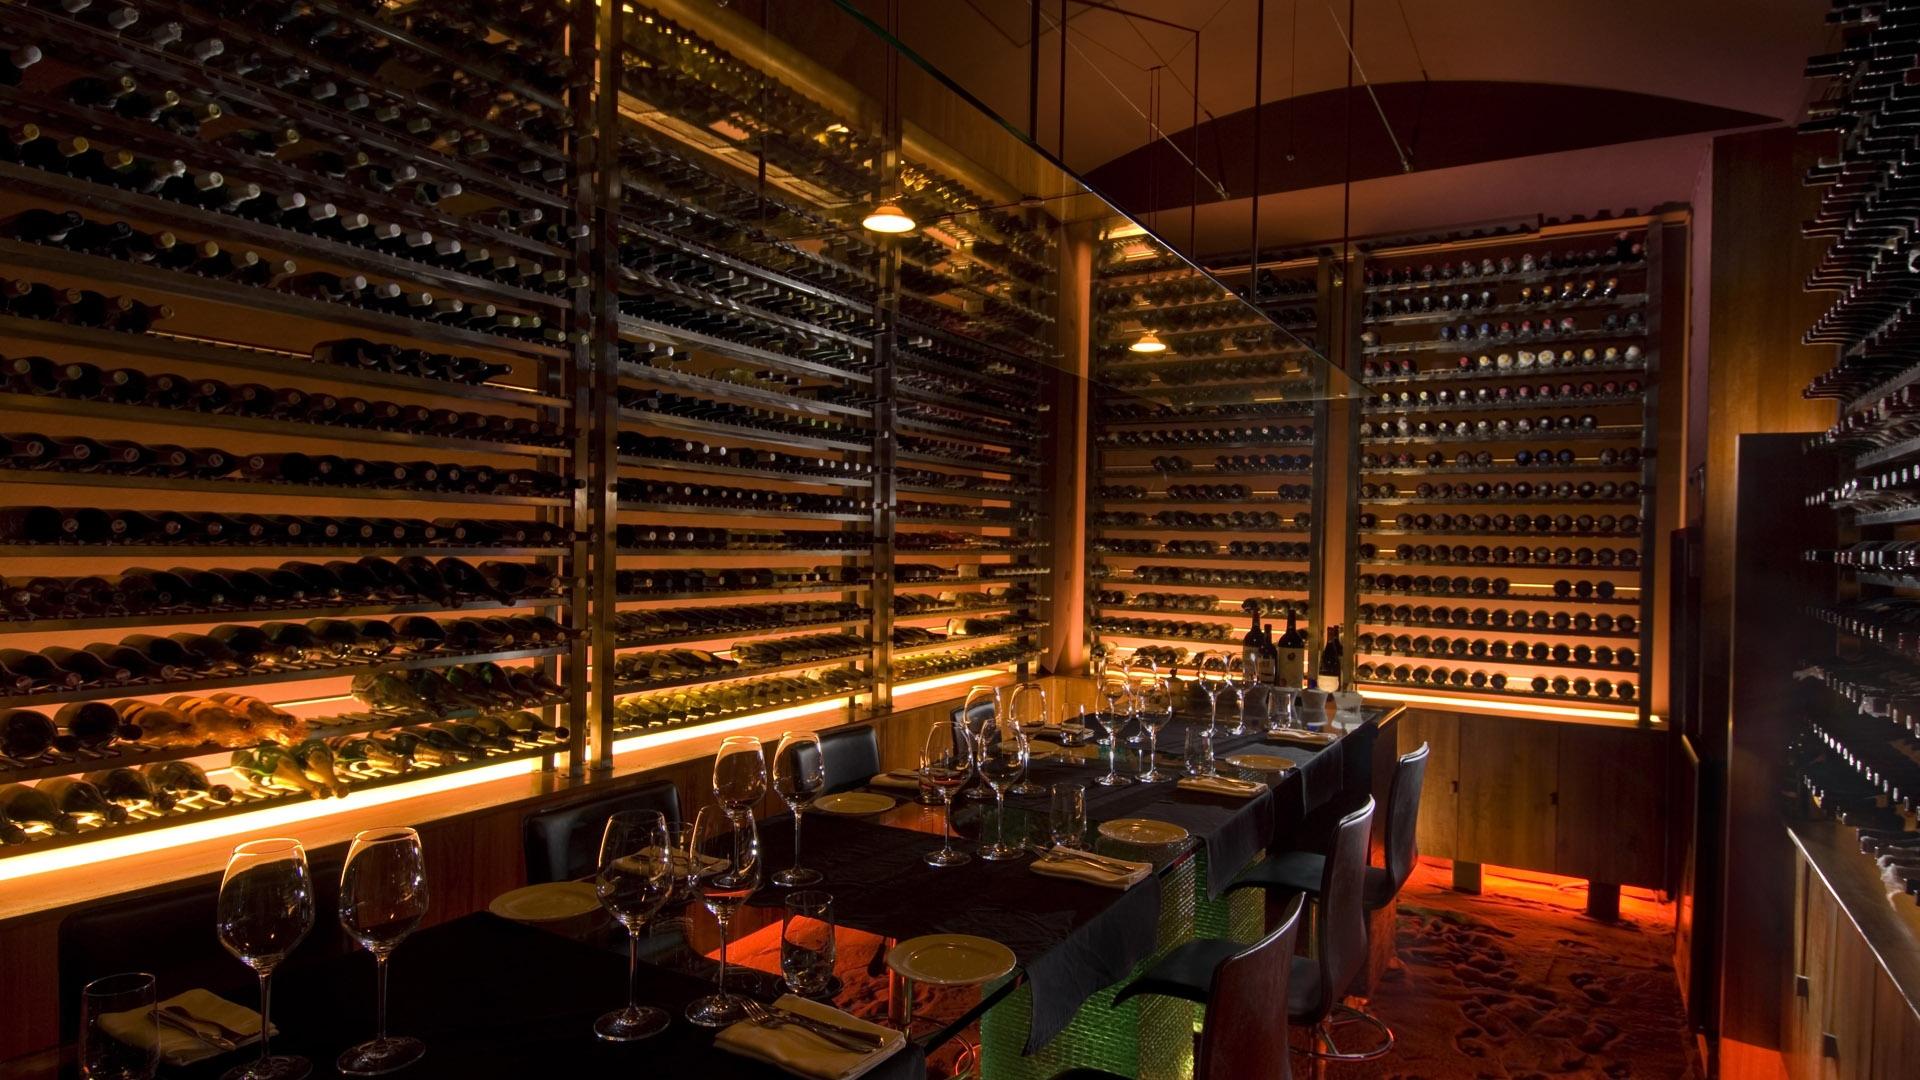 Download Wallpaper 1920x1080 Cafe Restaurant Wine Wine Racks Design Full Hd 1080p Hd Background